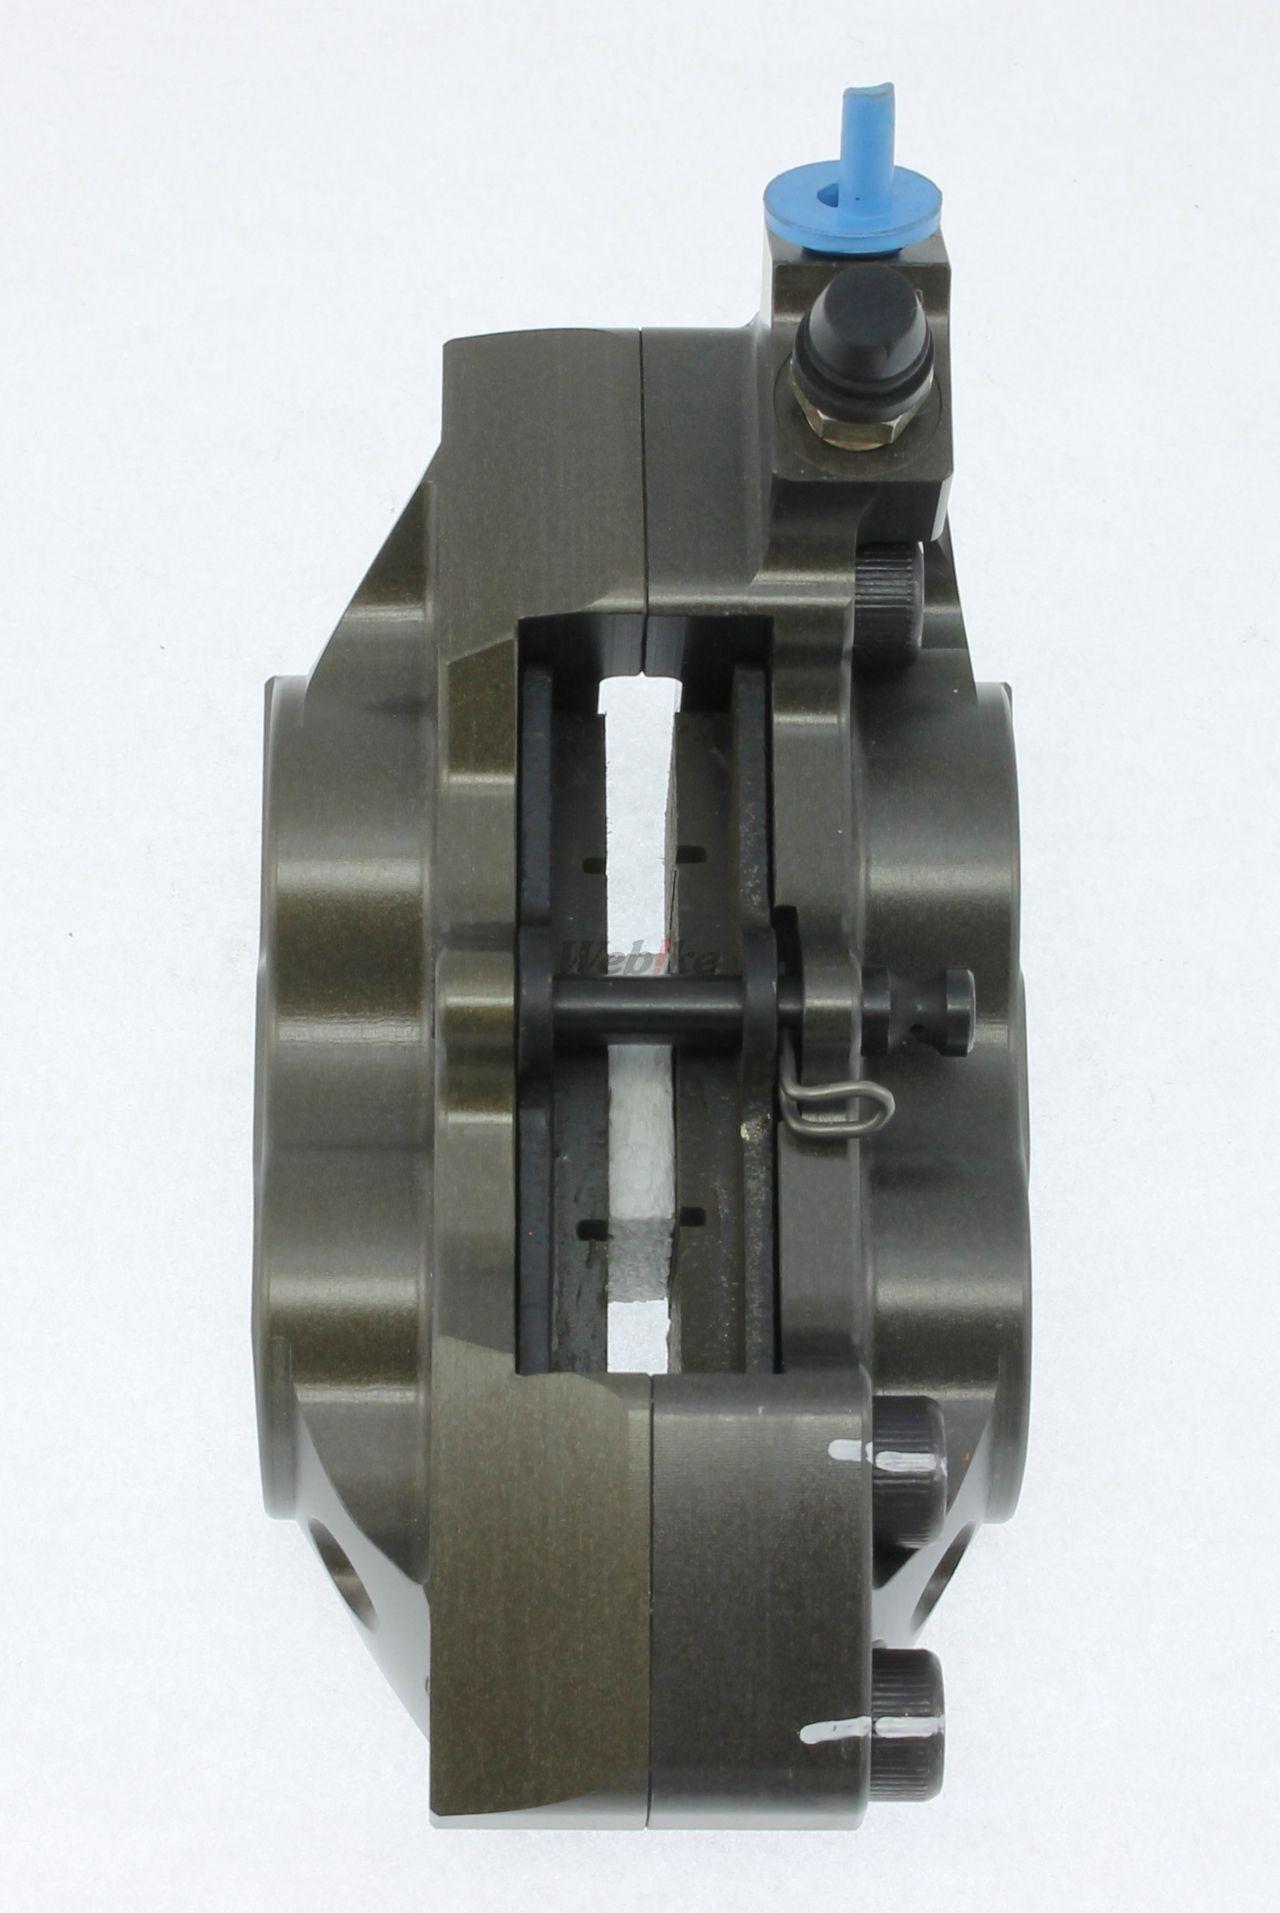 【brembo】煞車卡鉗 P4 30/34 40mm - 「Webike-摩托百貨」